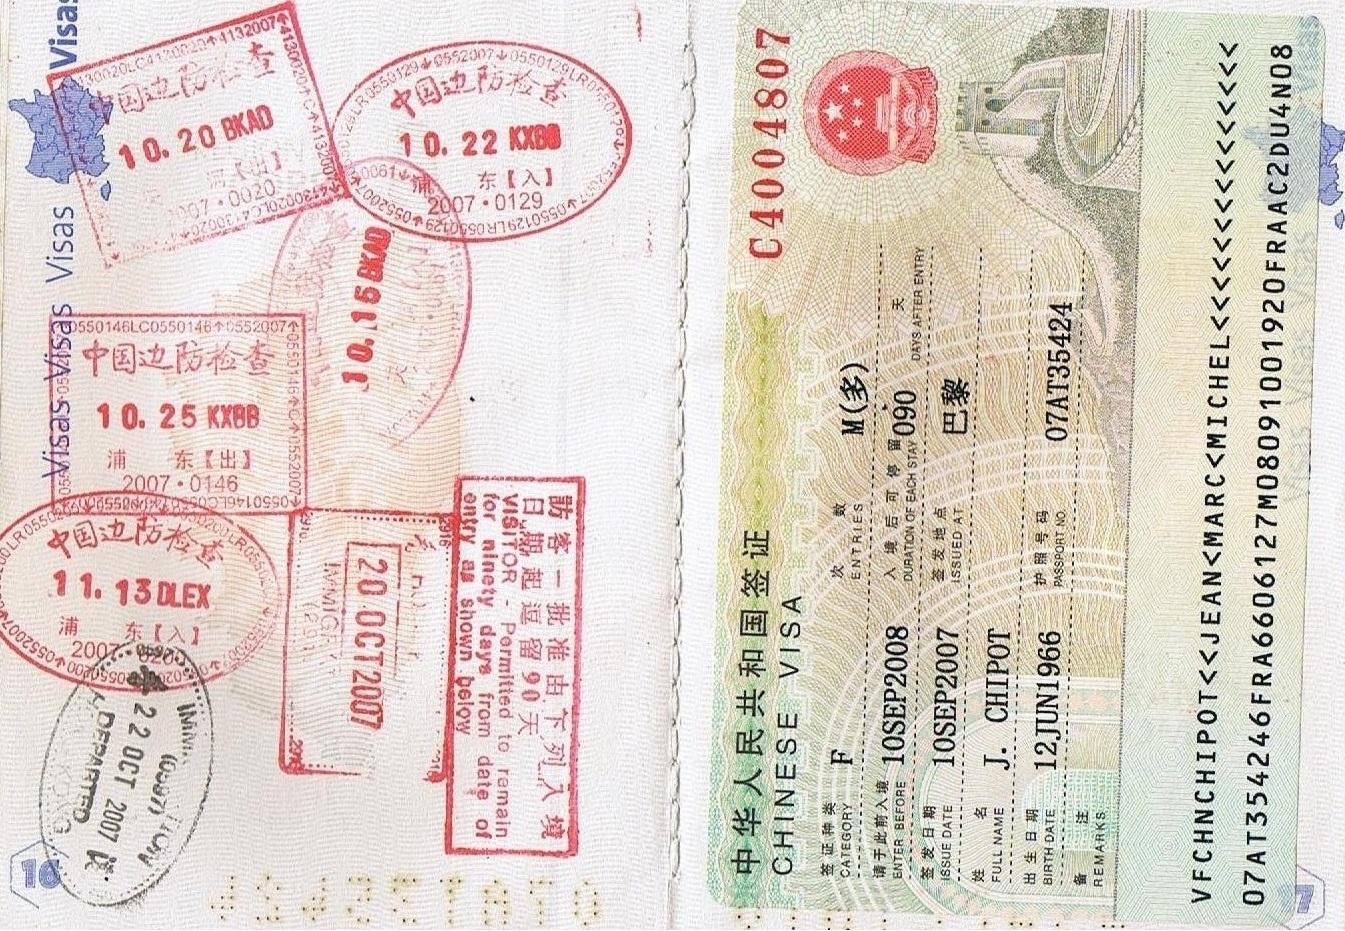 JMC Passeport 2007 pp16-17